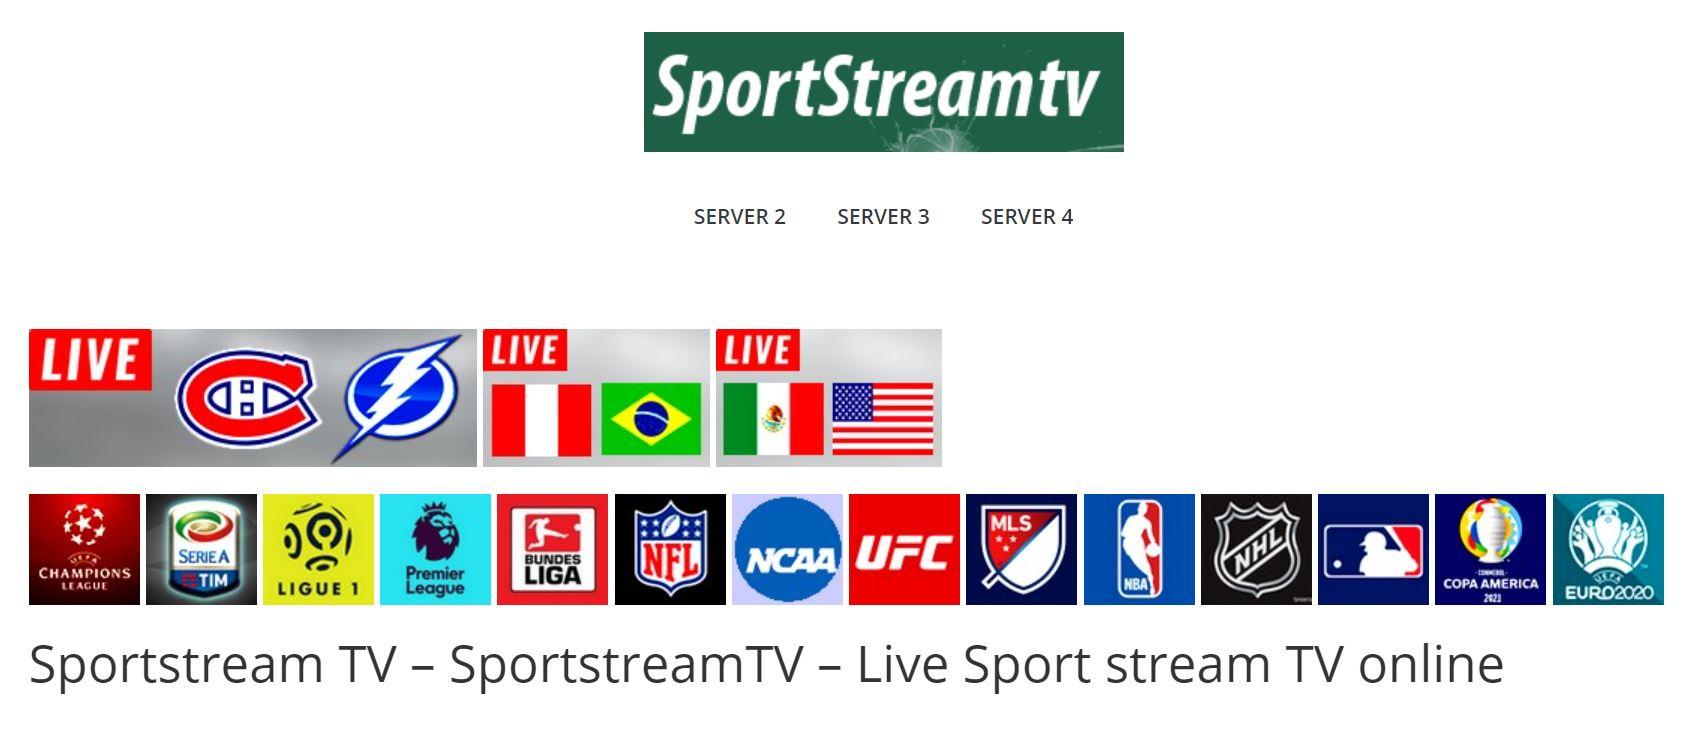 SportsStreamTV